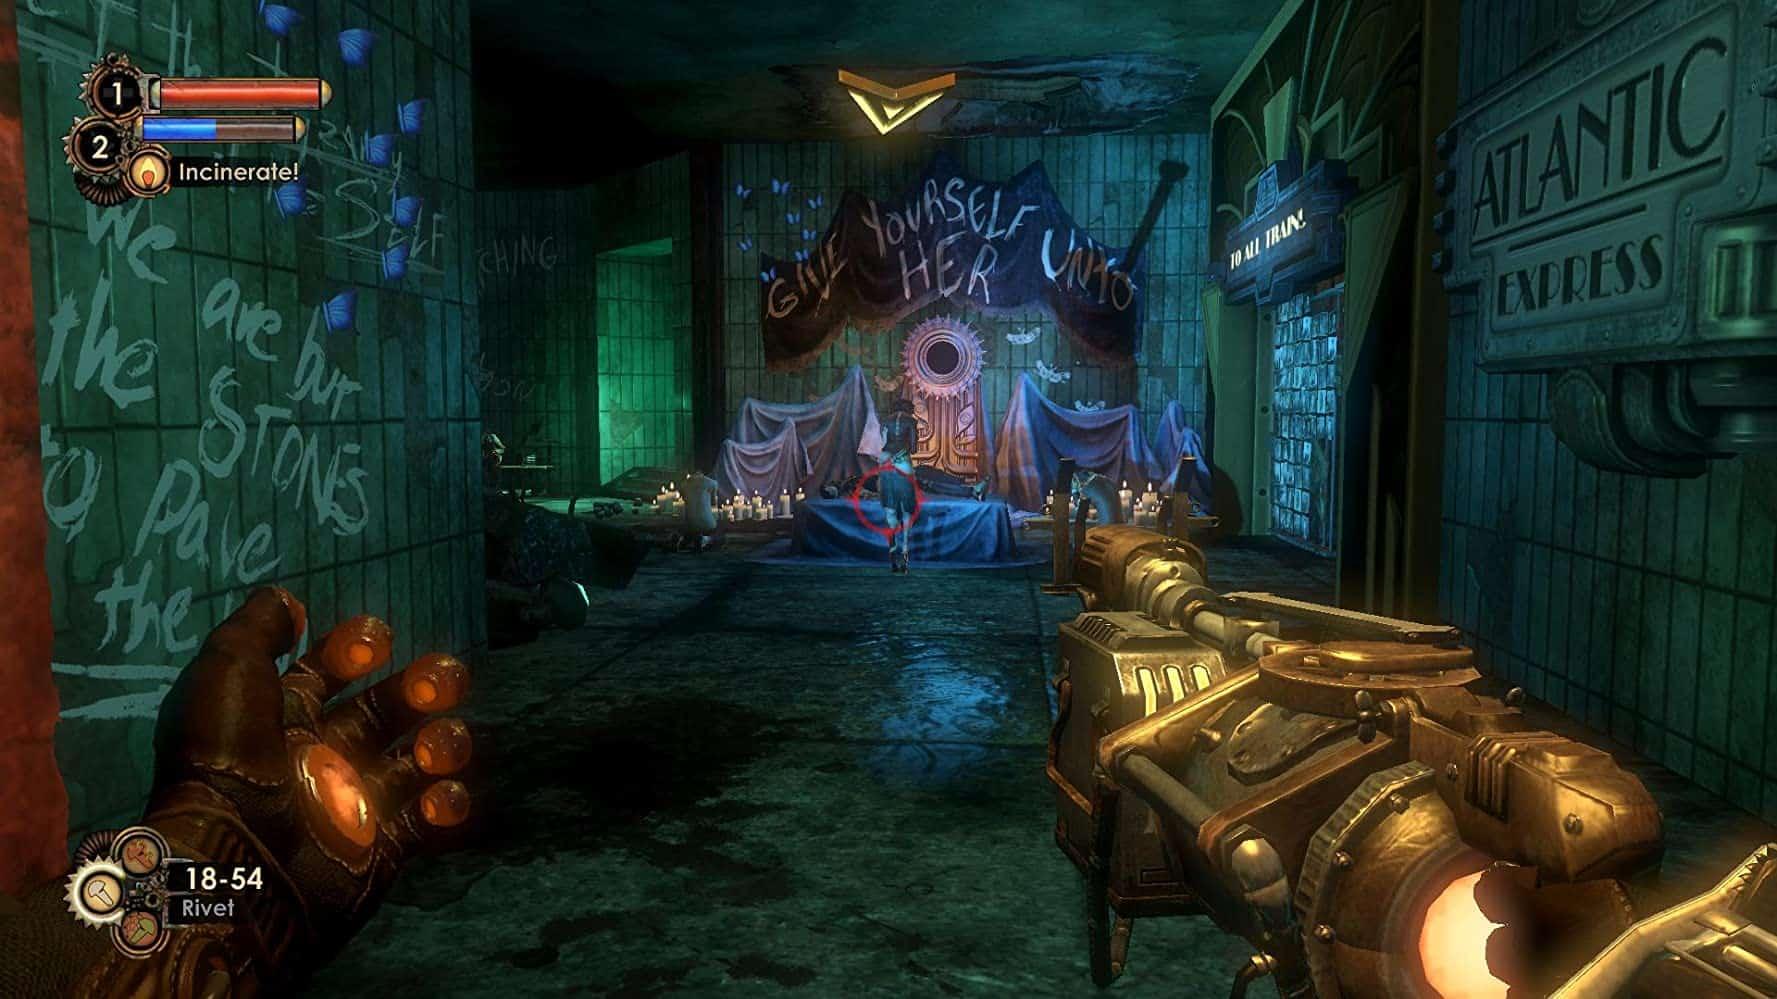 BioShock 2 from 2K Marin is the best one, better than BioShock Infinite